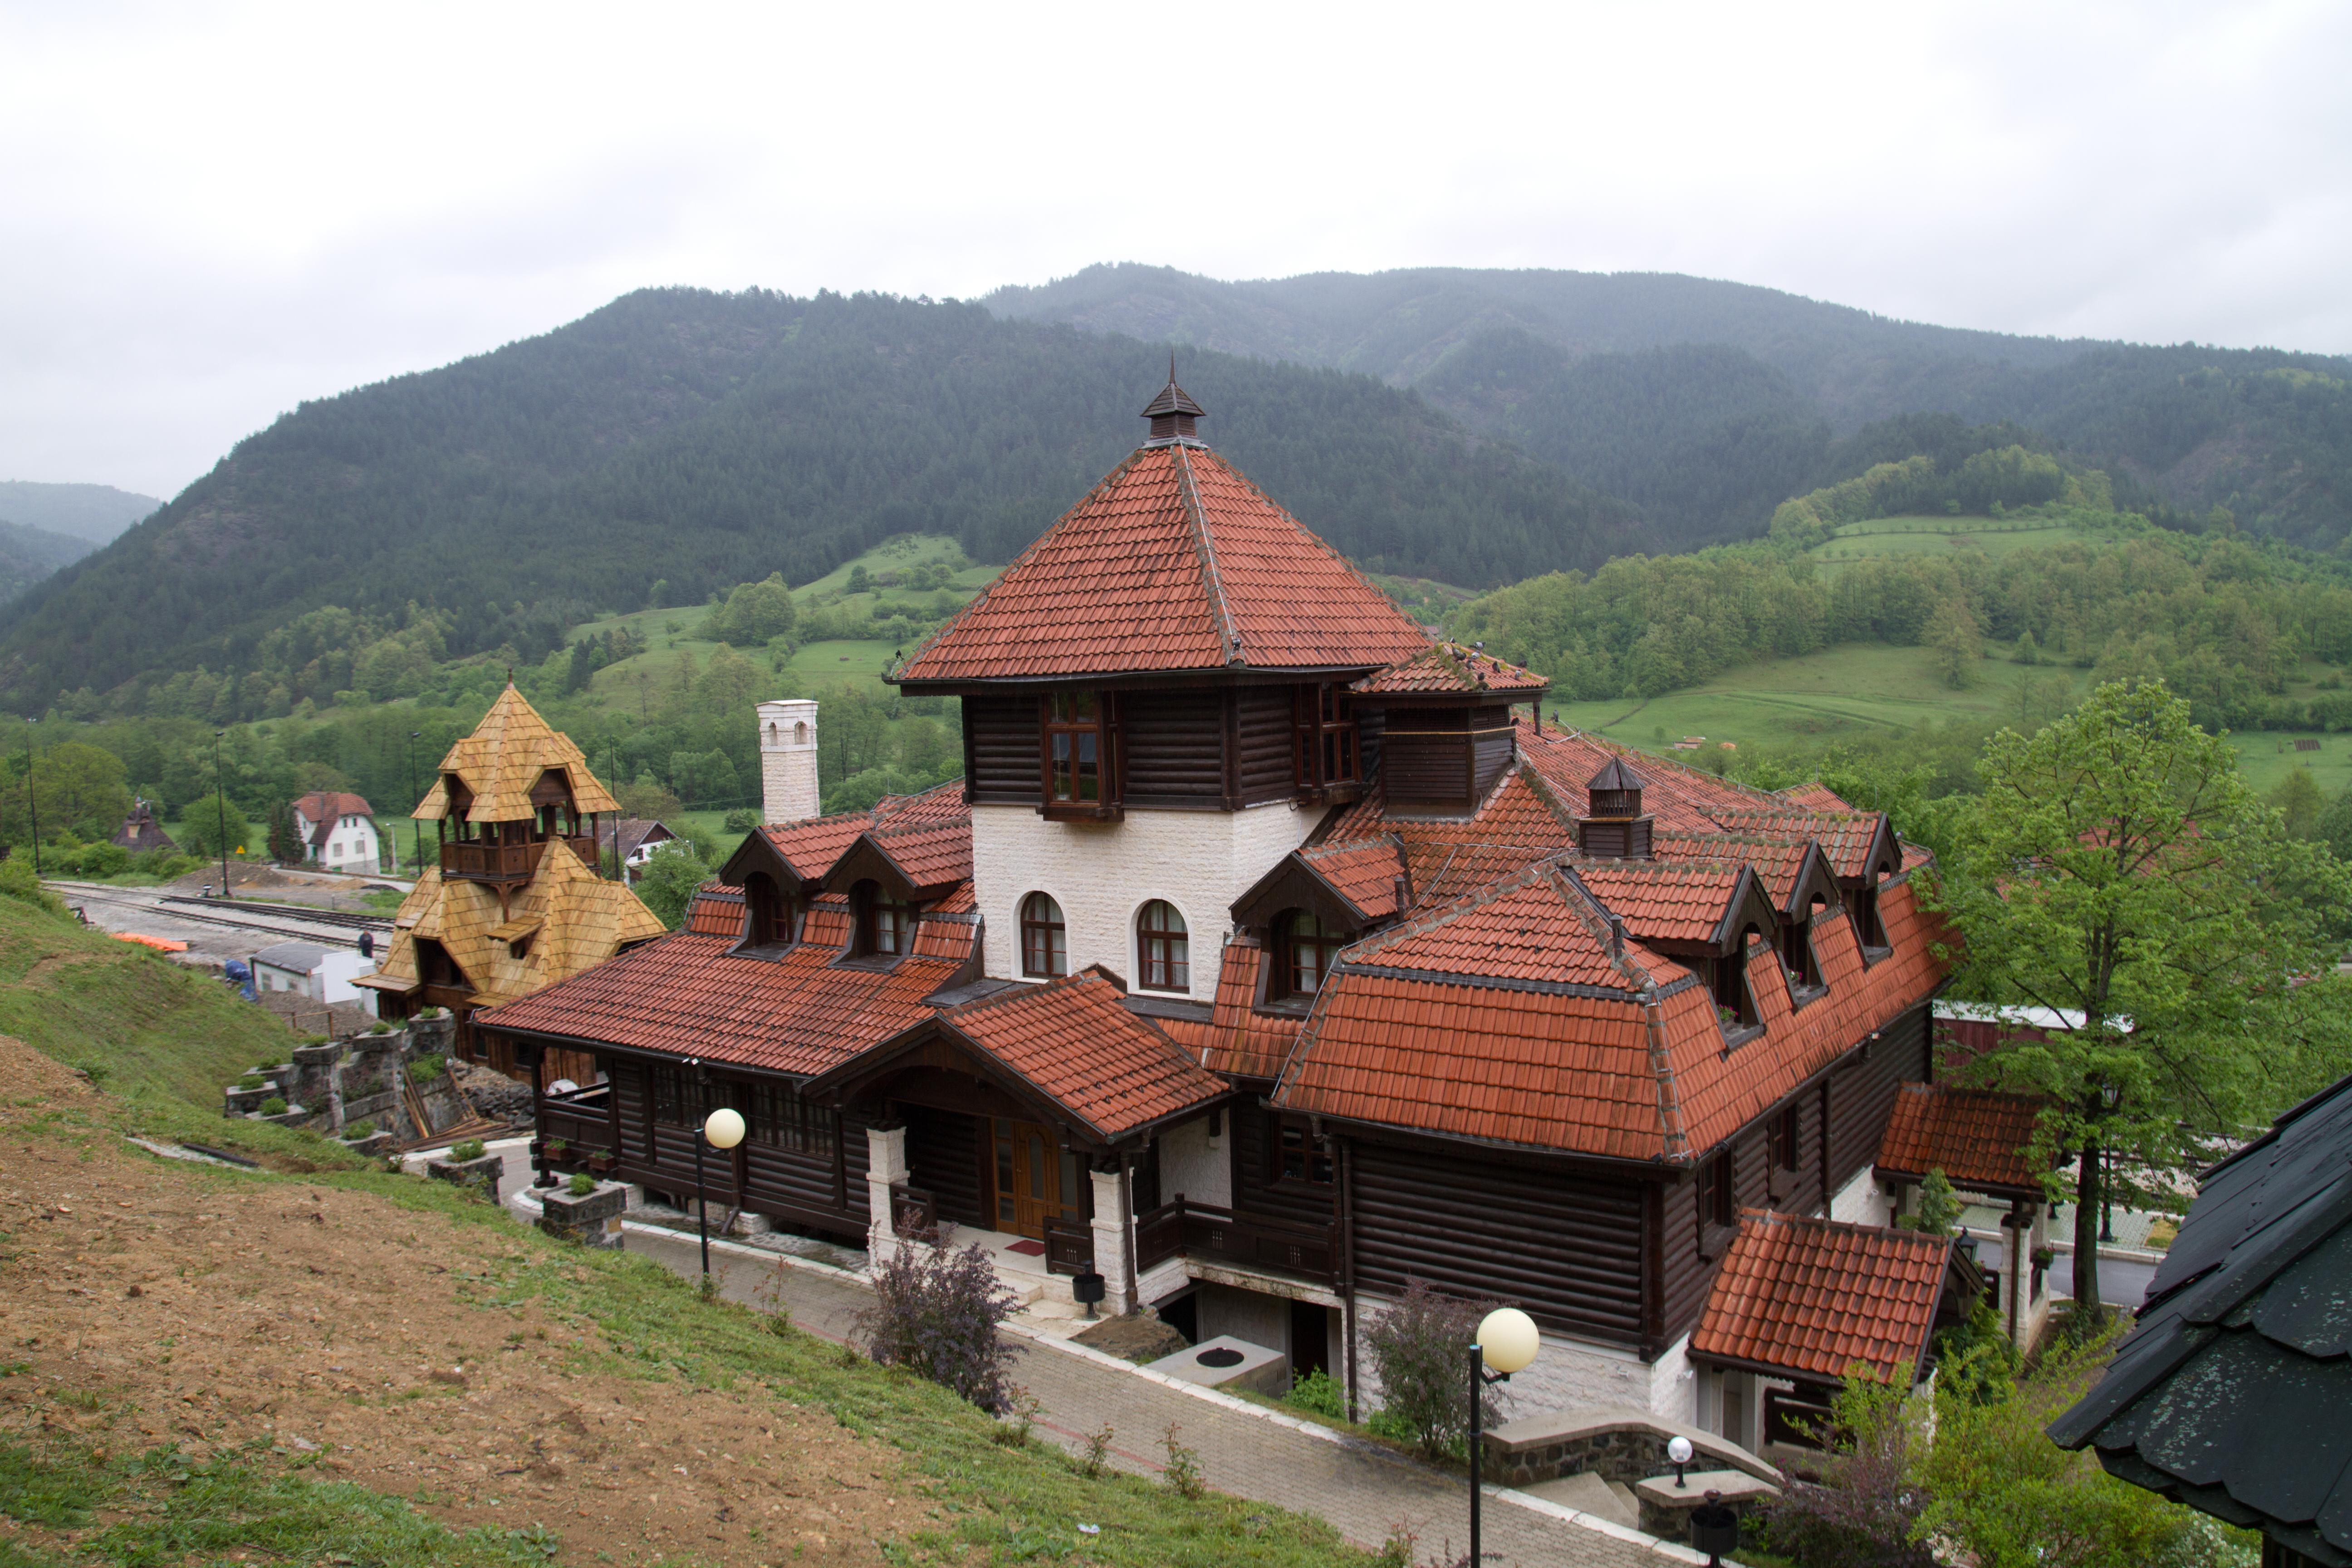 File:Mokra Gora, Uzice, Serbia 2012.jpg - Wikimedia Commons